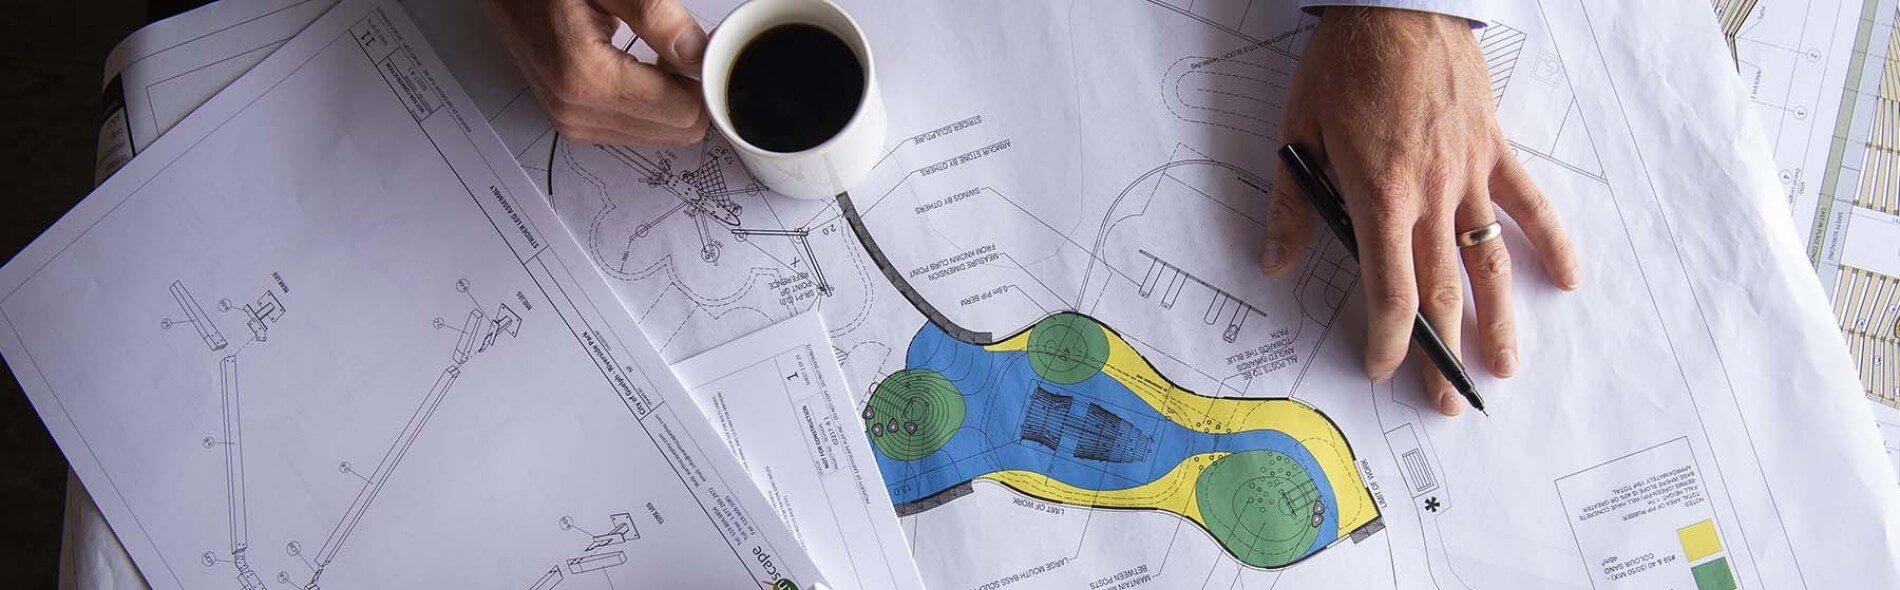 fanshawe-honours_bachelor_of_environmental_design_and_planning_2020